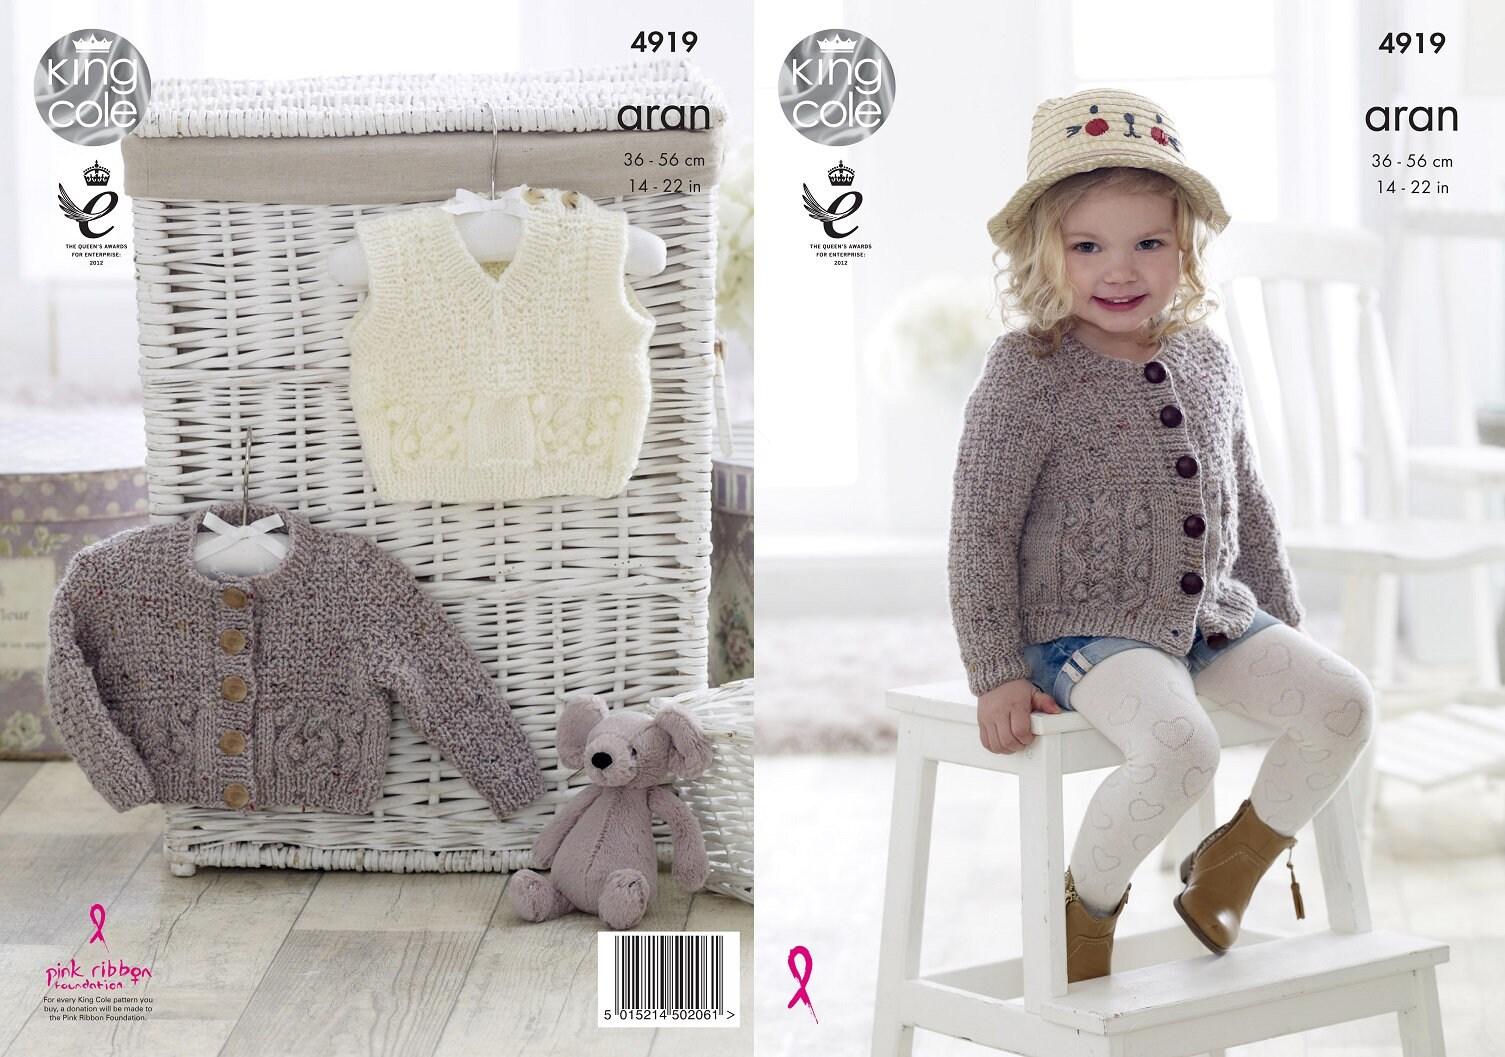 King Cole Aran knitting pattern no 4919 baby Cardigan and   Etsy